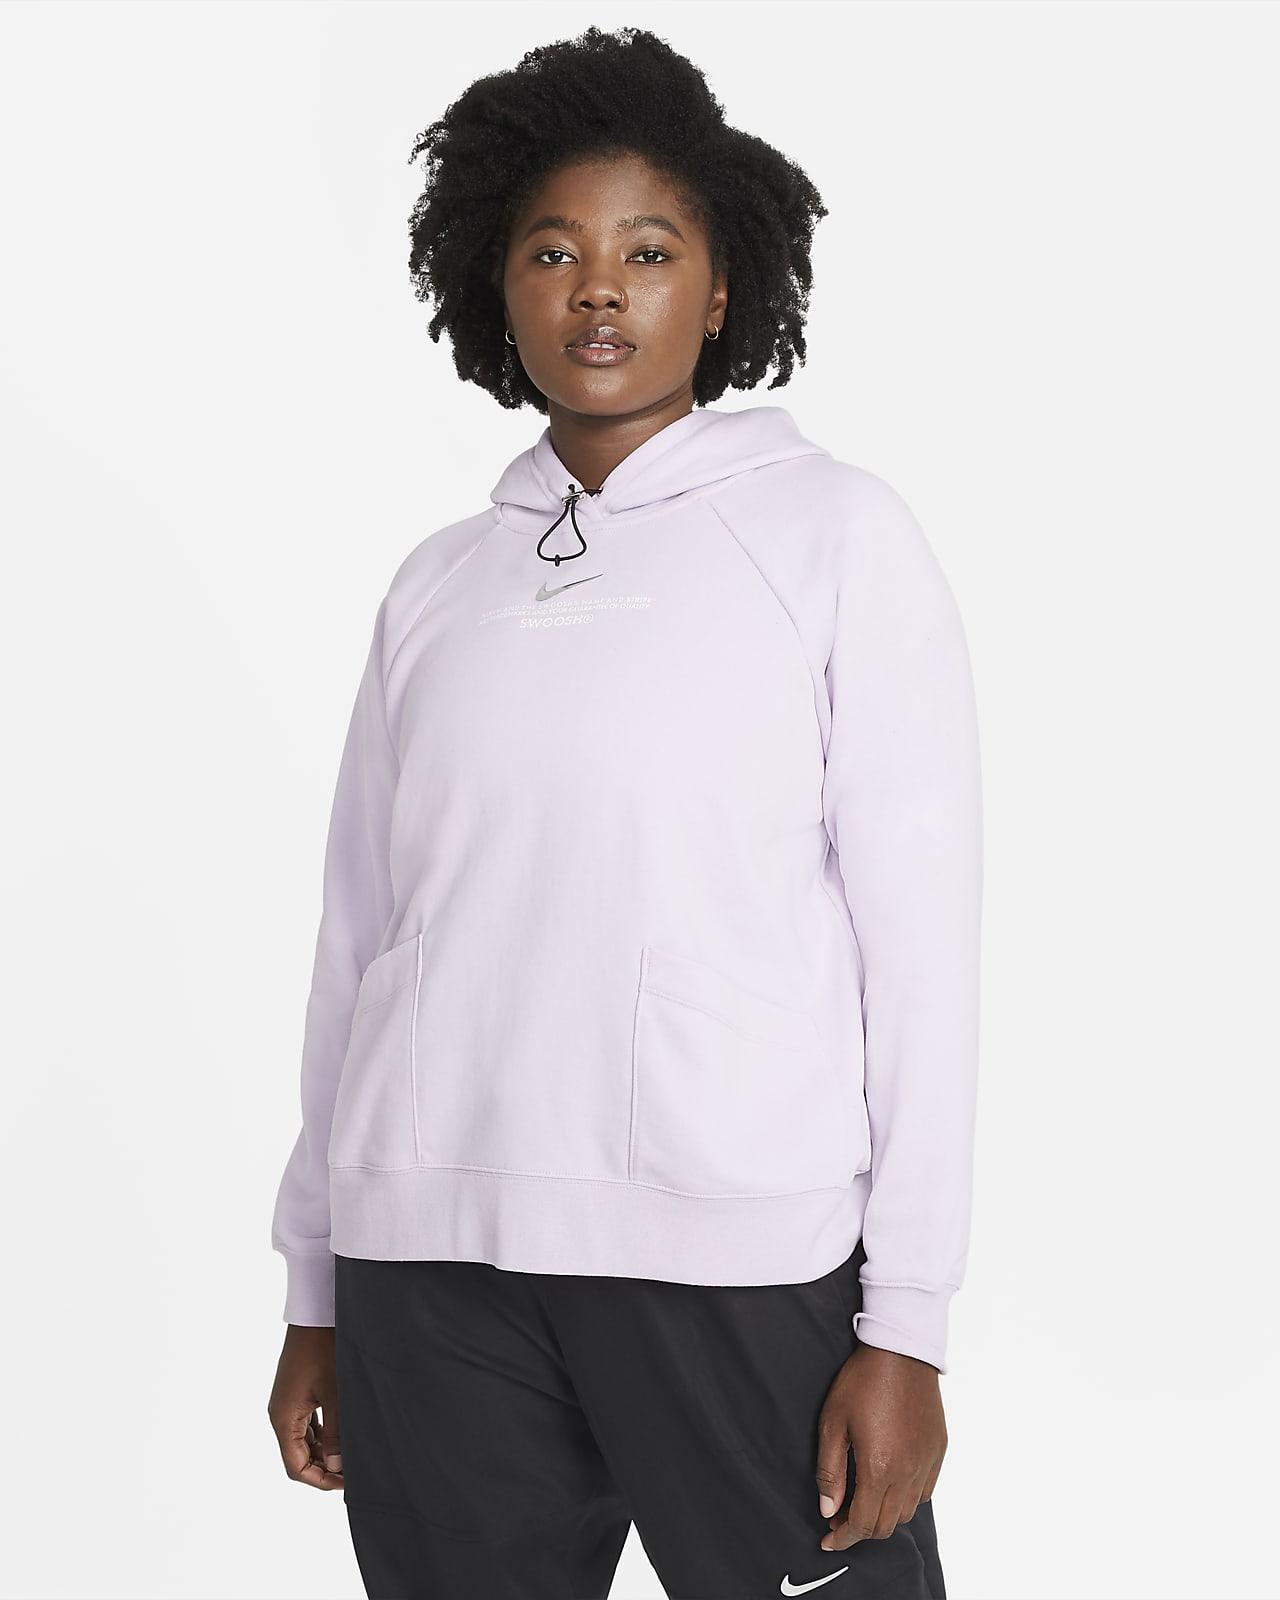 Sudadera con capucha para mujer Nike Sportswear Swoosh (talla grande)